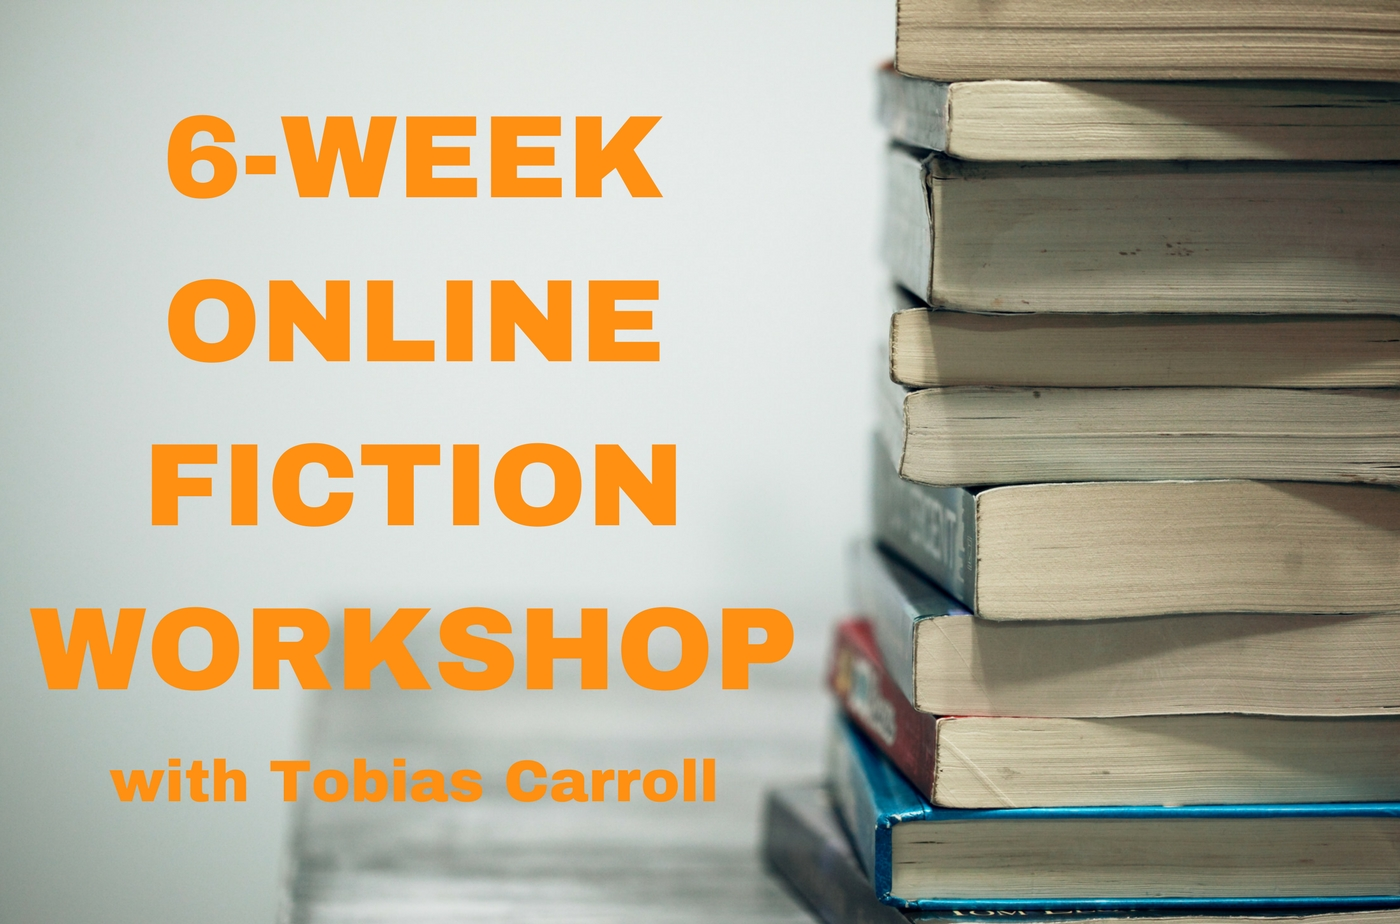 Catapult online classes: Tobias Carroll, 6-Week Online Fiction Workshop, Fiction, Workshop